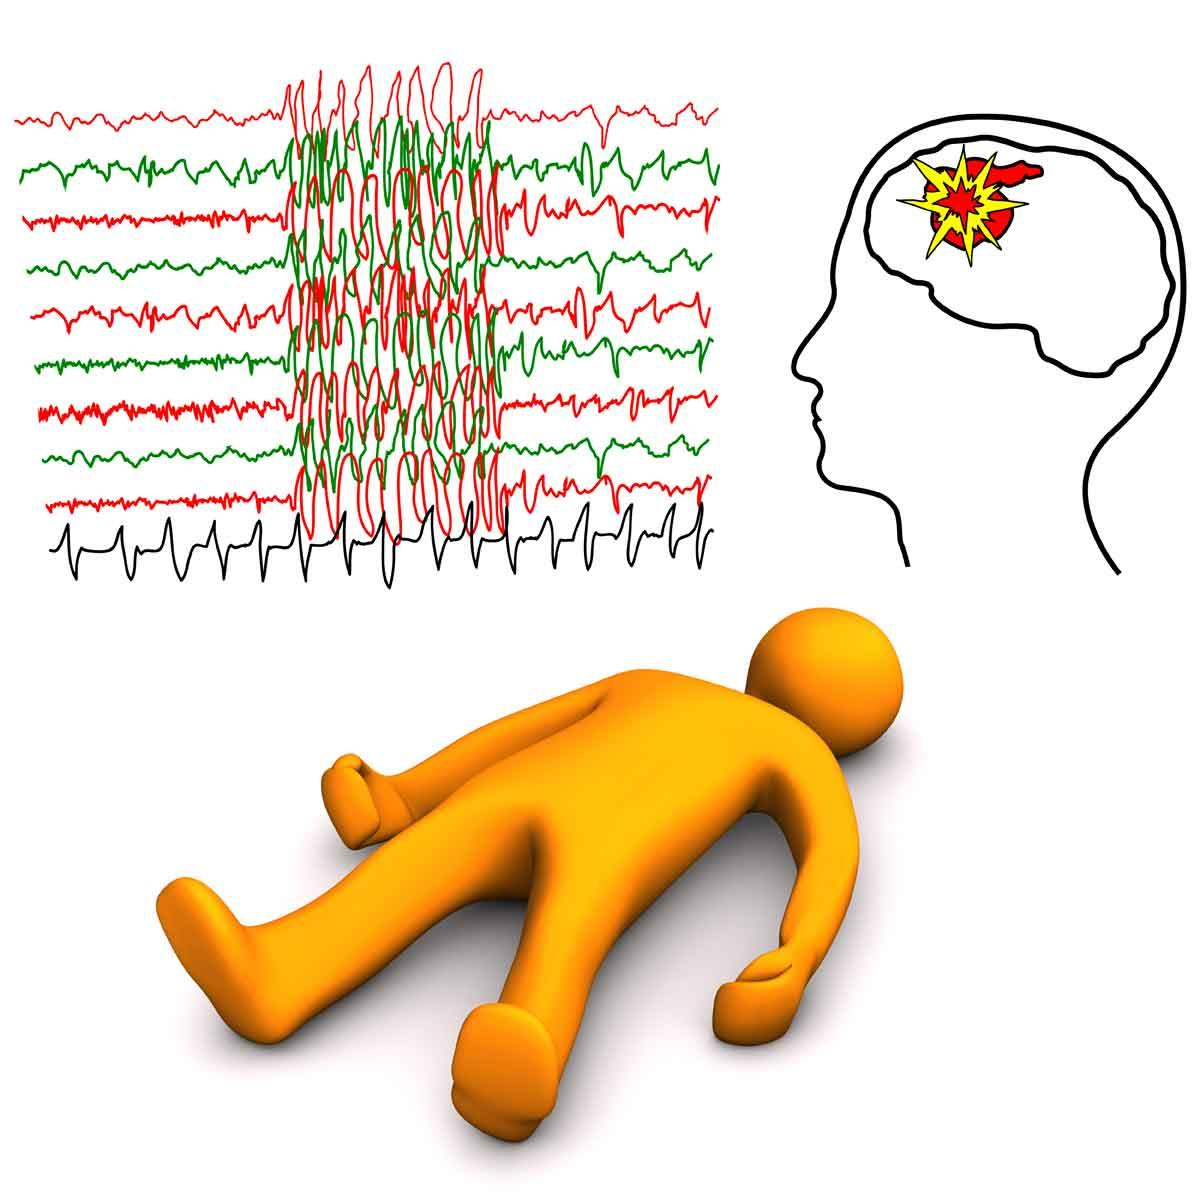 Risk Factors for Developing Epilepsy